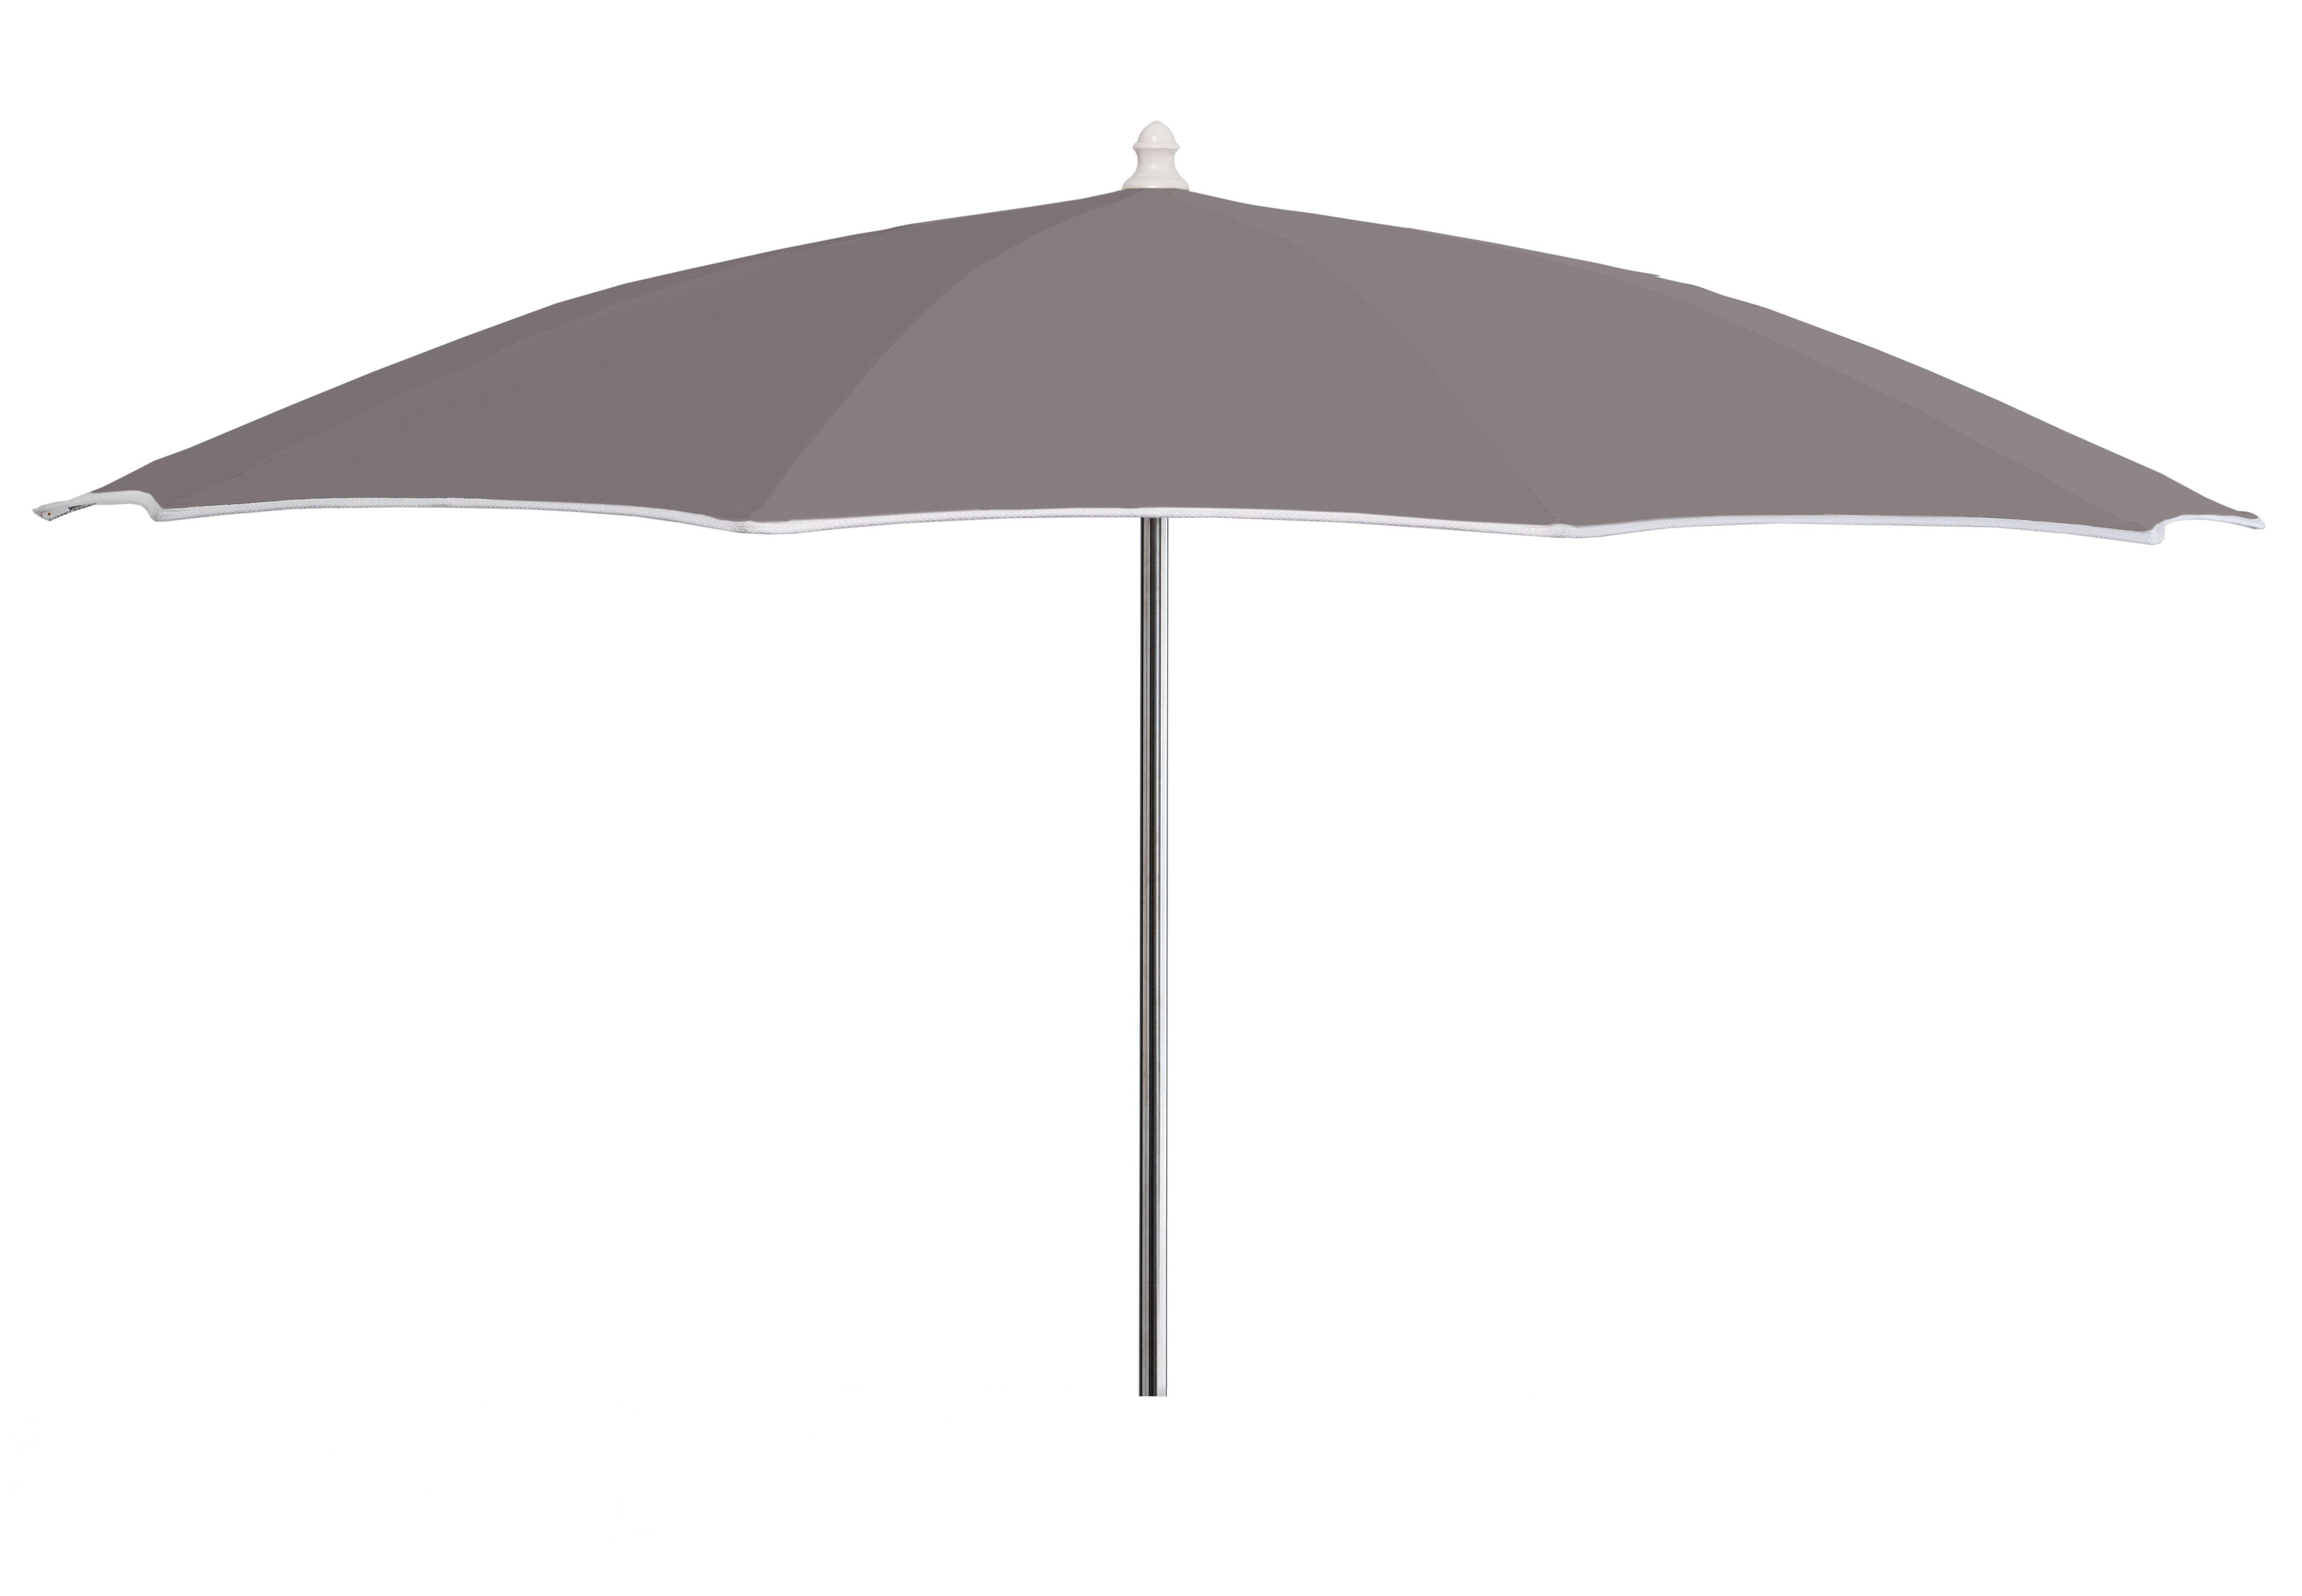 Outdoor - Parasols - Aluminium Parasol - Ø 200 cm by Vlaemynck - Grey - Lacquered aluminium, Sunbrella canvas